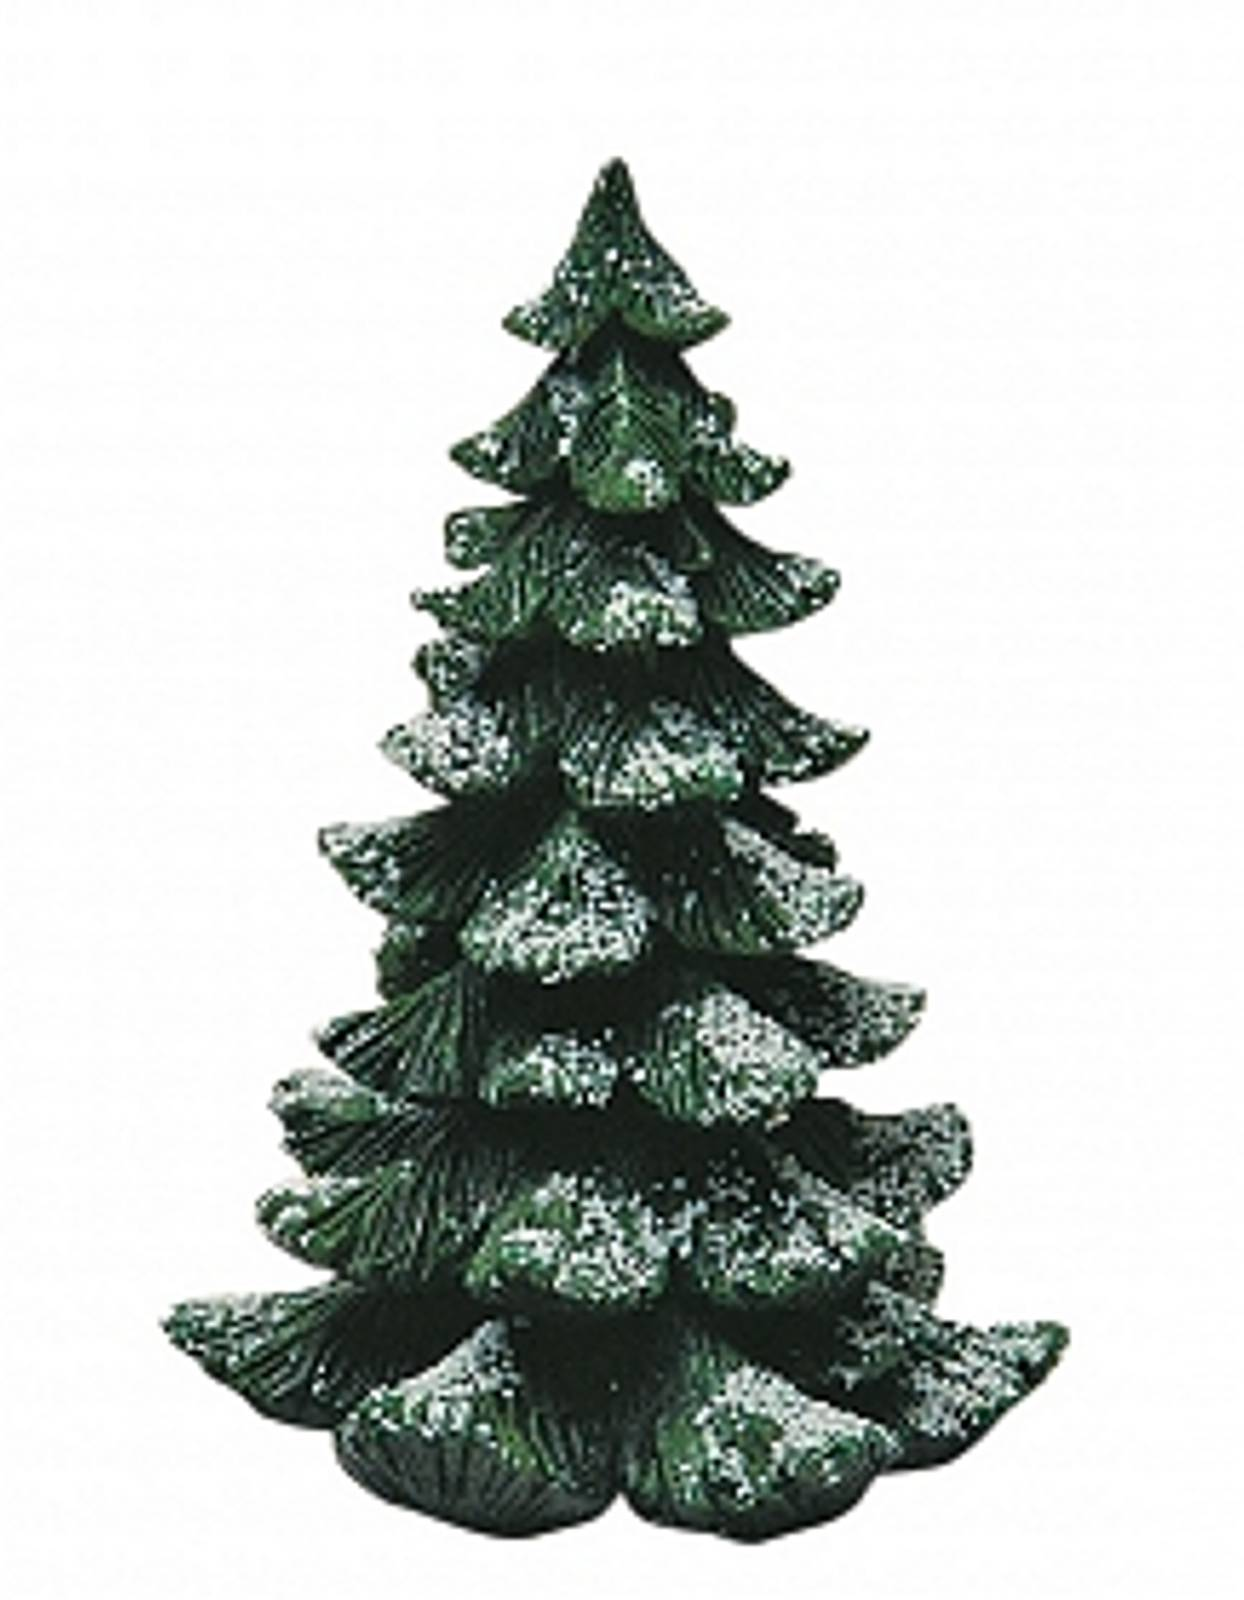 Lichthaus Wurm Accessories Pinetree Christmas Tree Pine Wide Slim